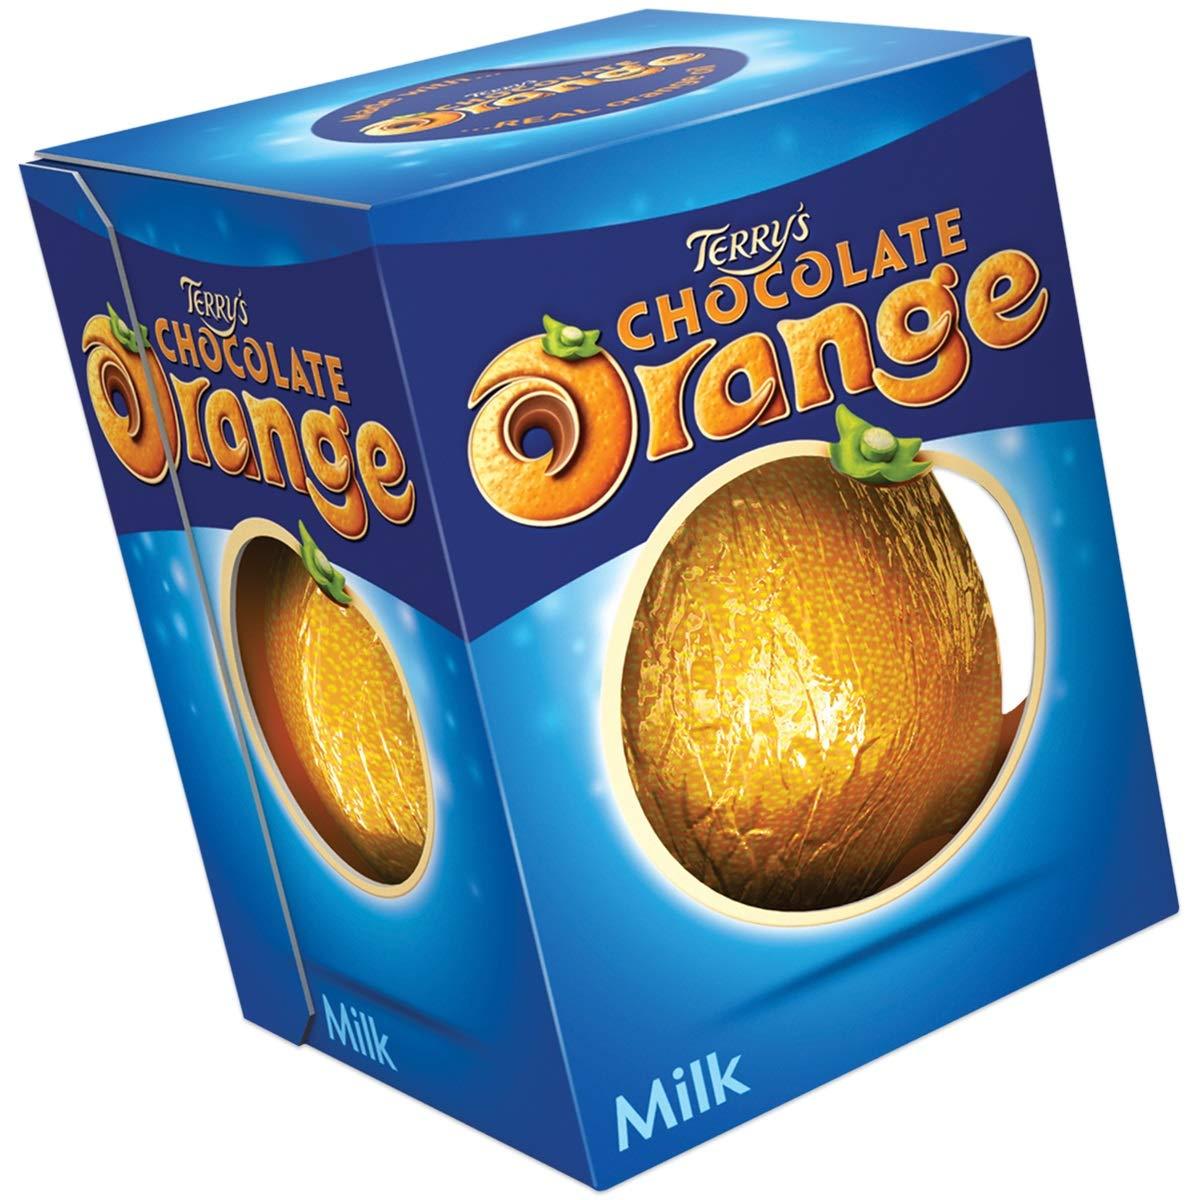 Terry's Chocolate Orange Milk Chocolate 5.53 oz. 2 pack